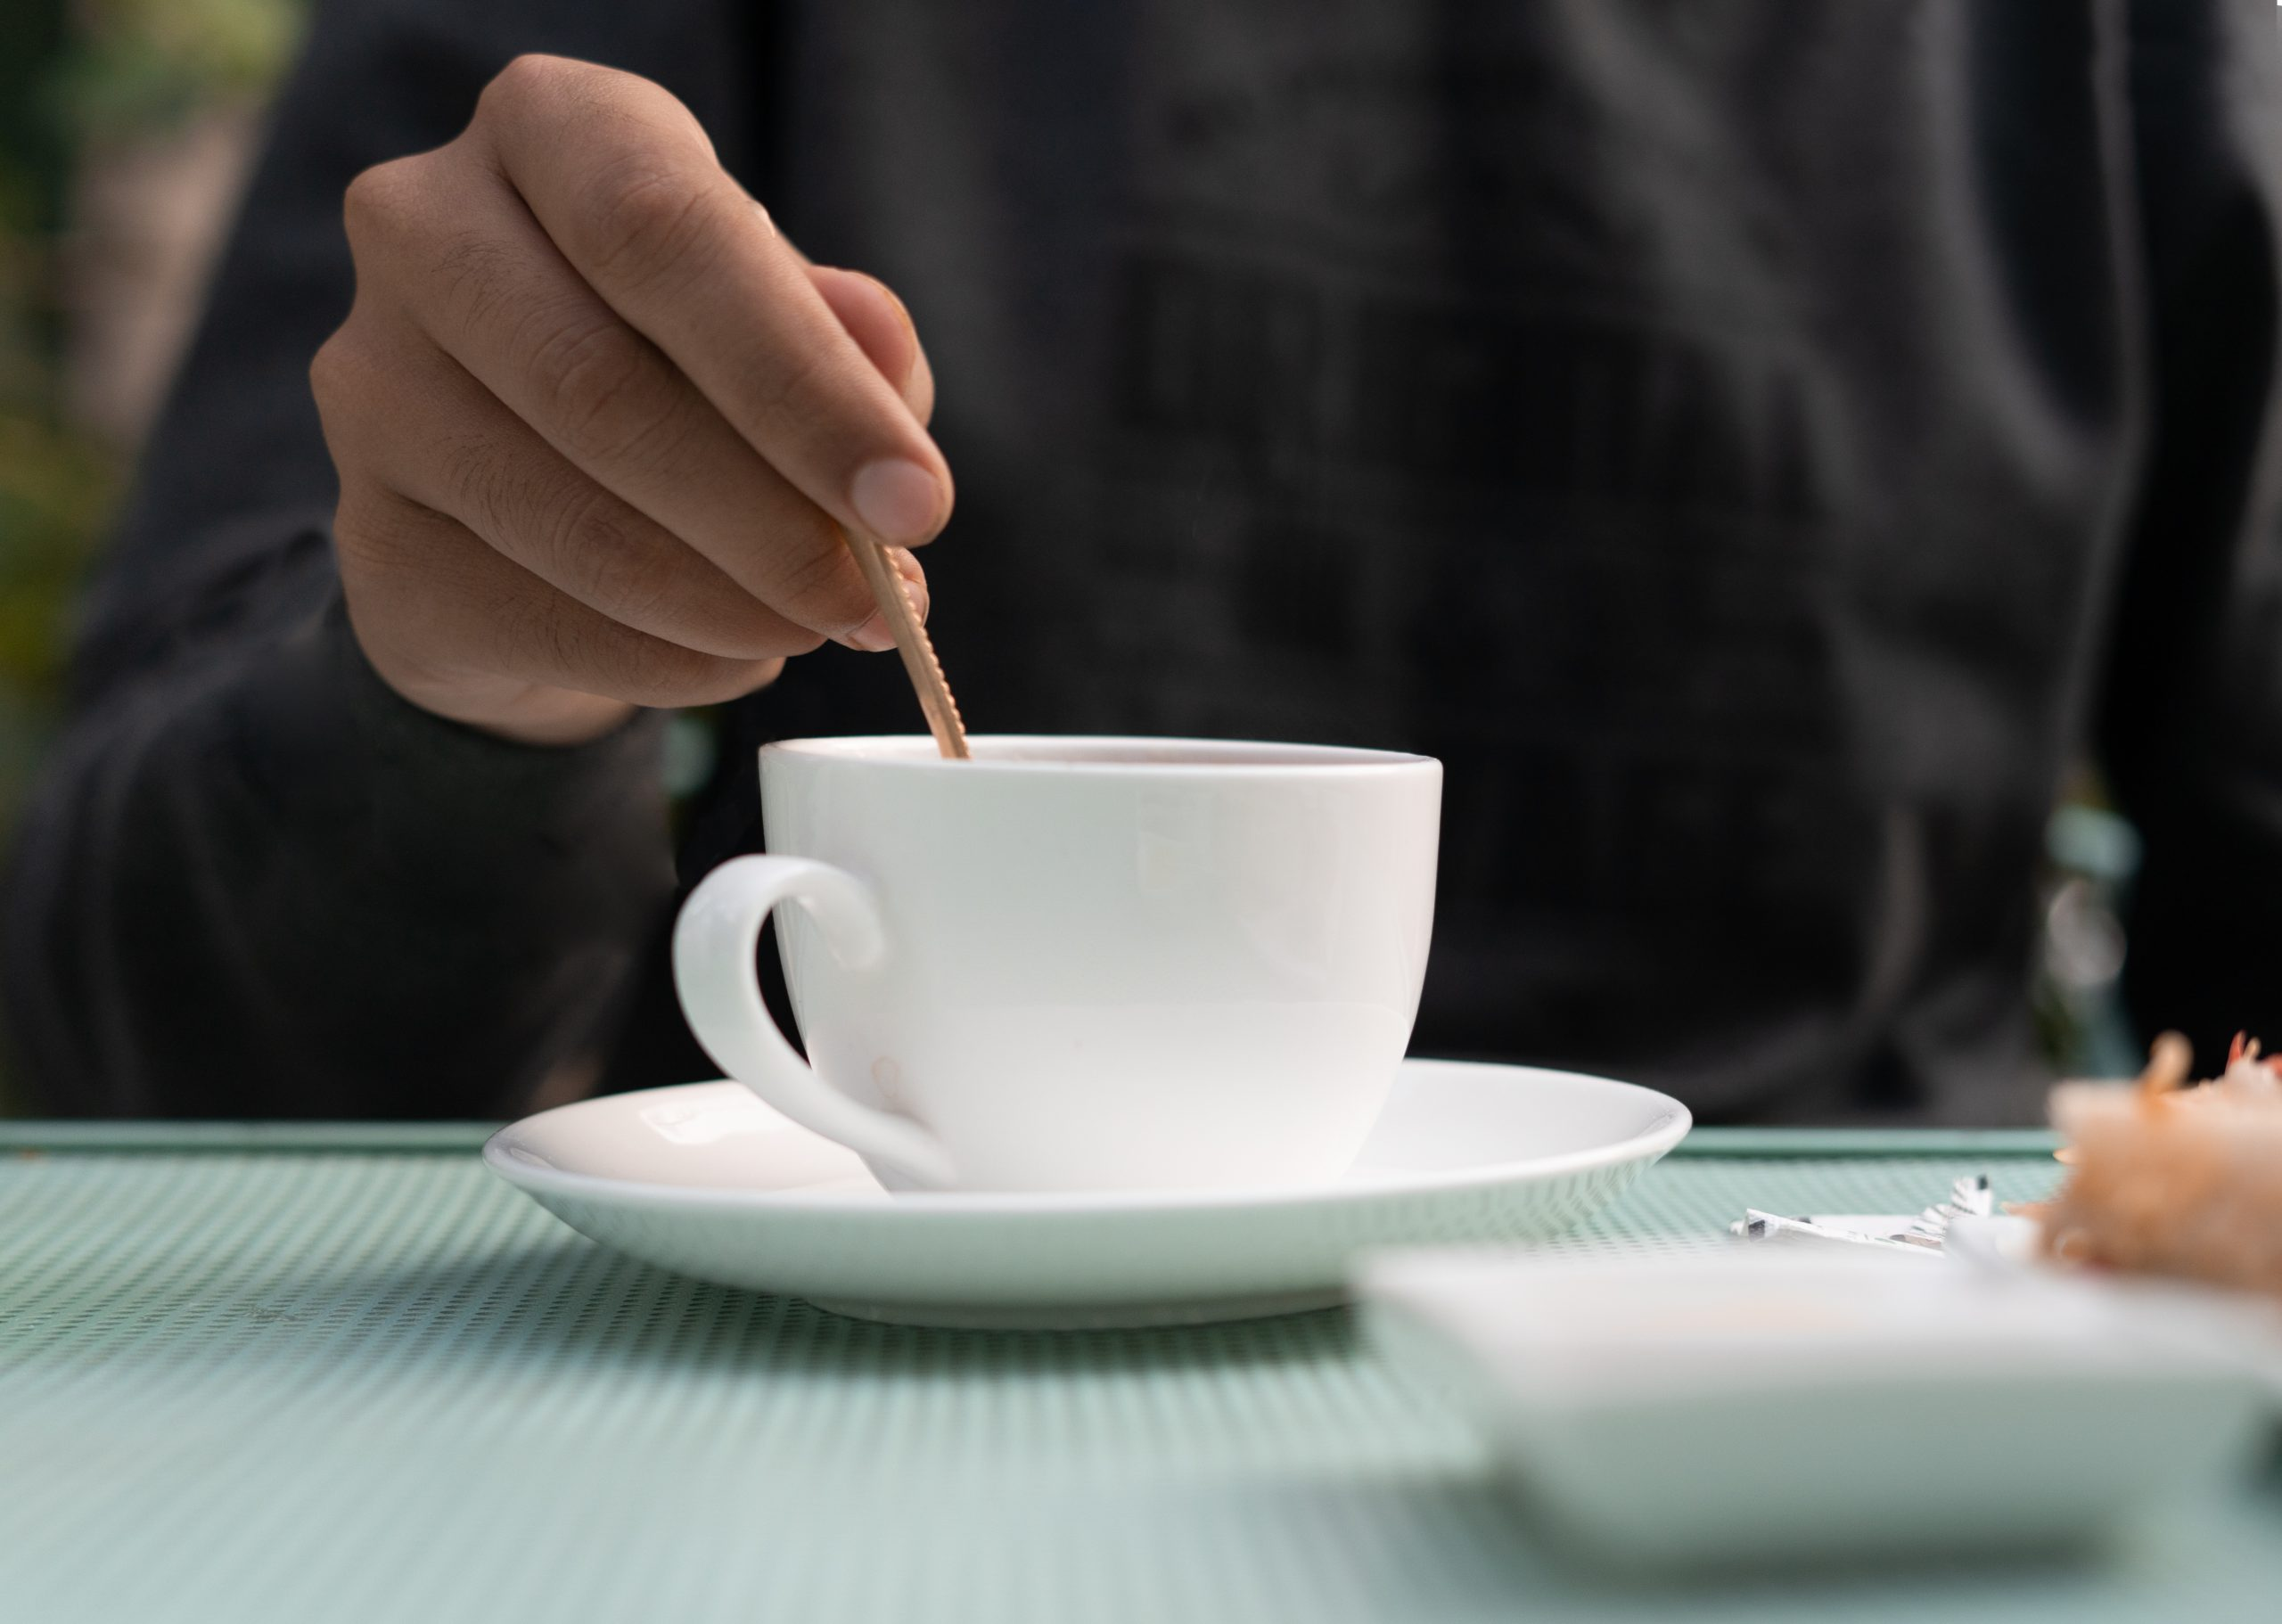 Boy mixing sugar in tea